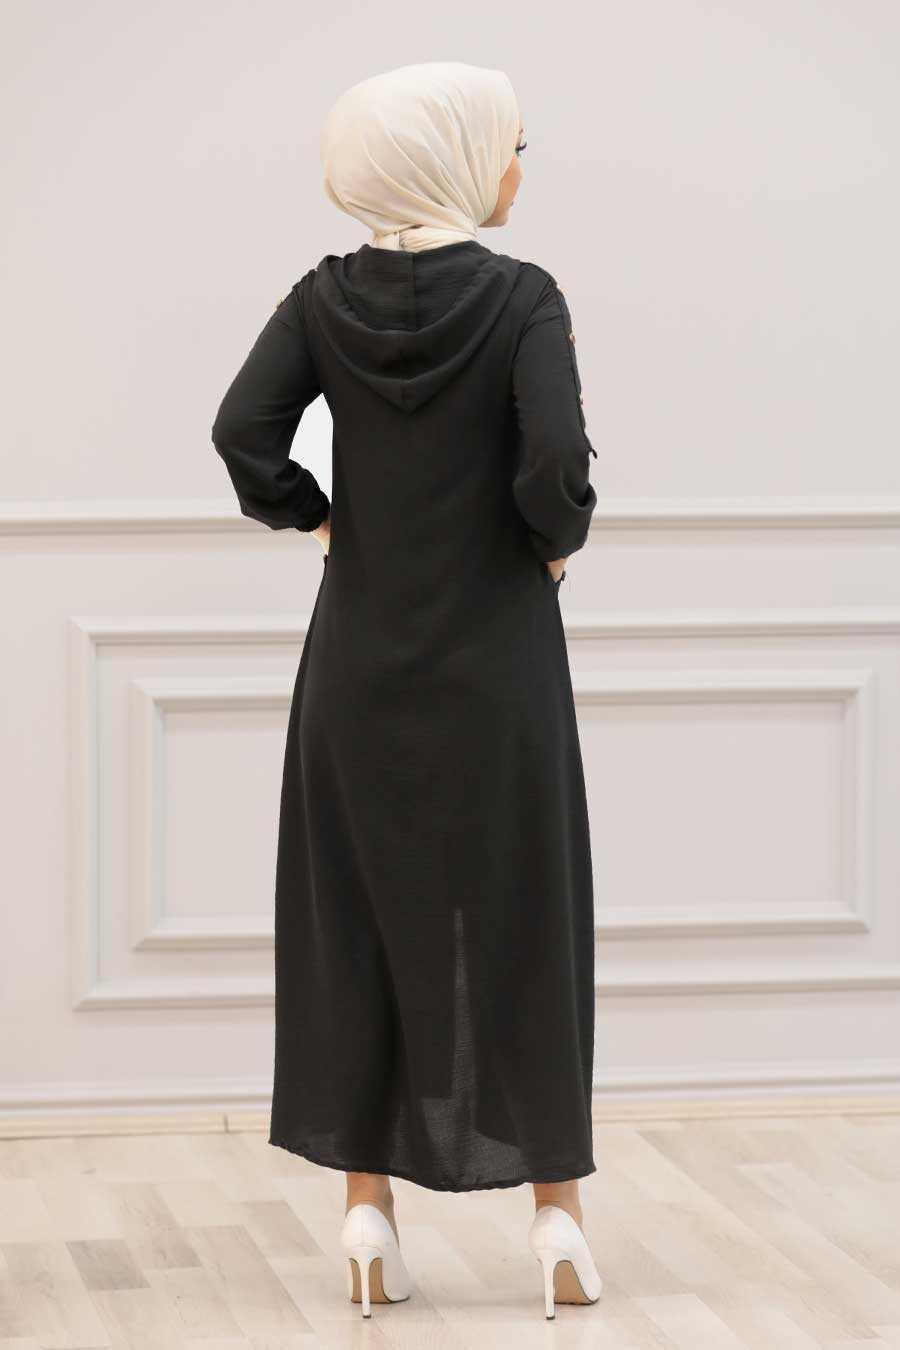 Black Hijab Coat 3729S